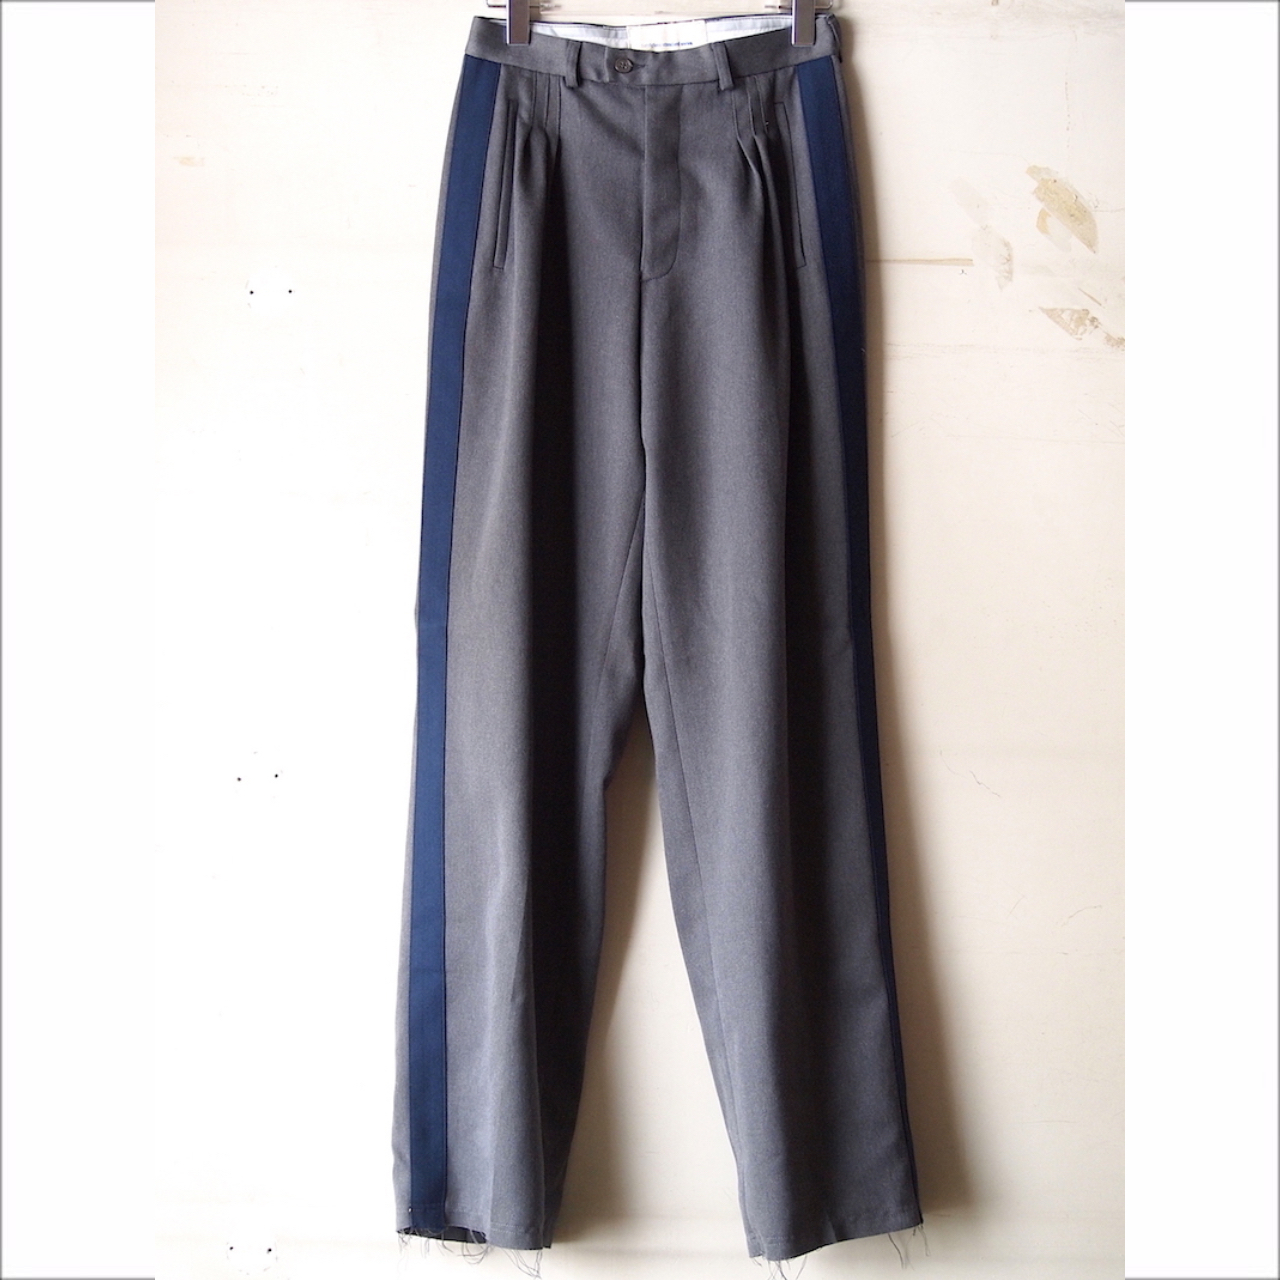 【sandglass】line tuck pants B / 【サンドグラス】ライン タック パンツ ビー